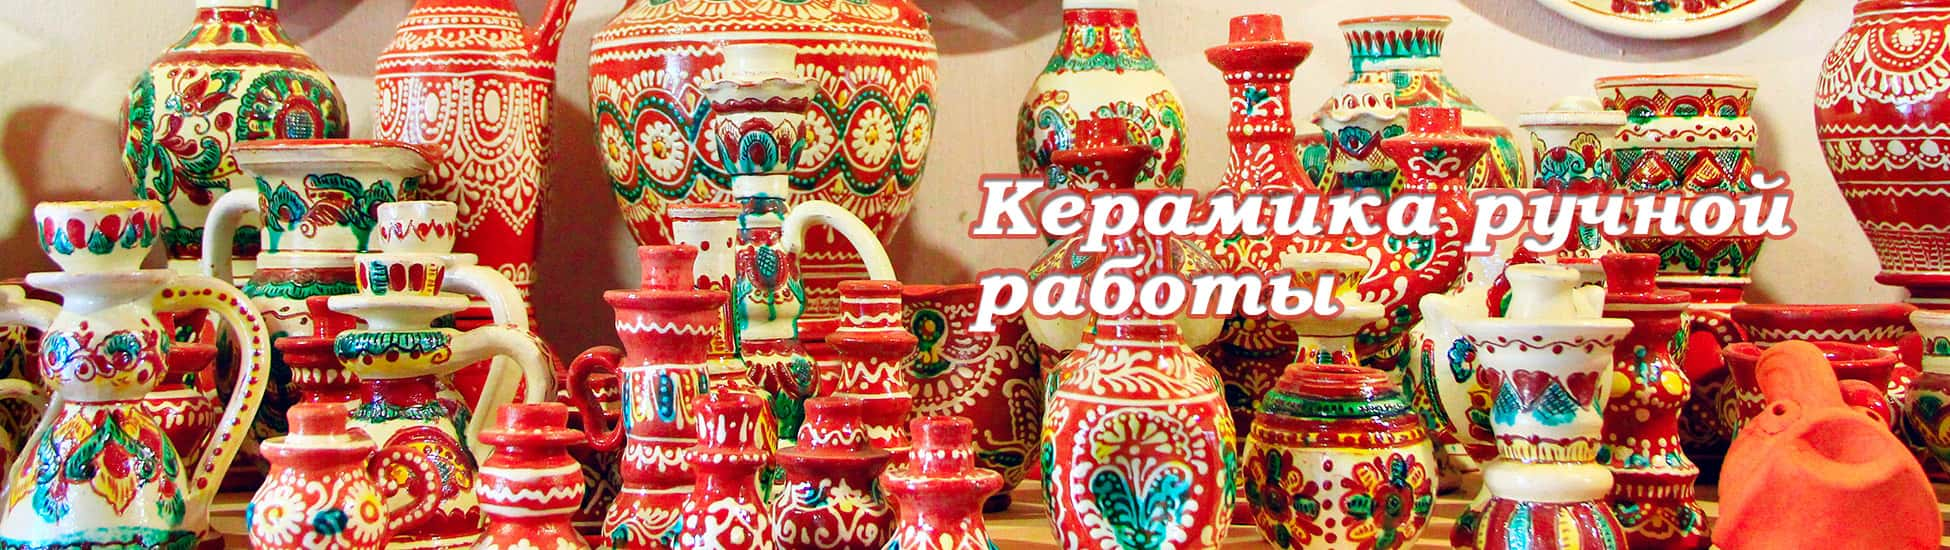 Интернет-магазин керамики